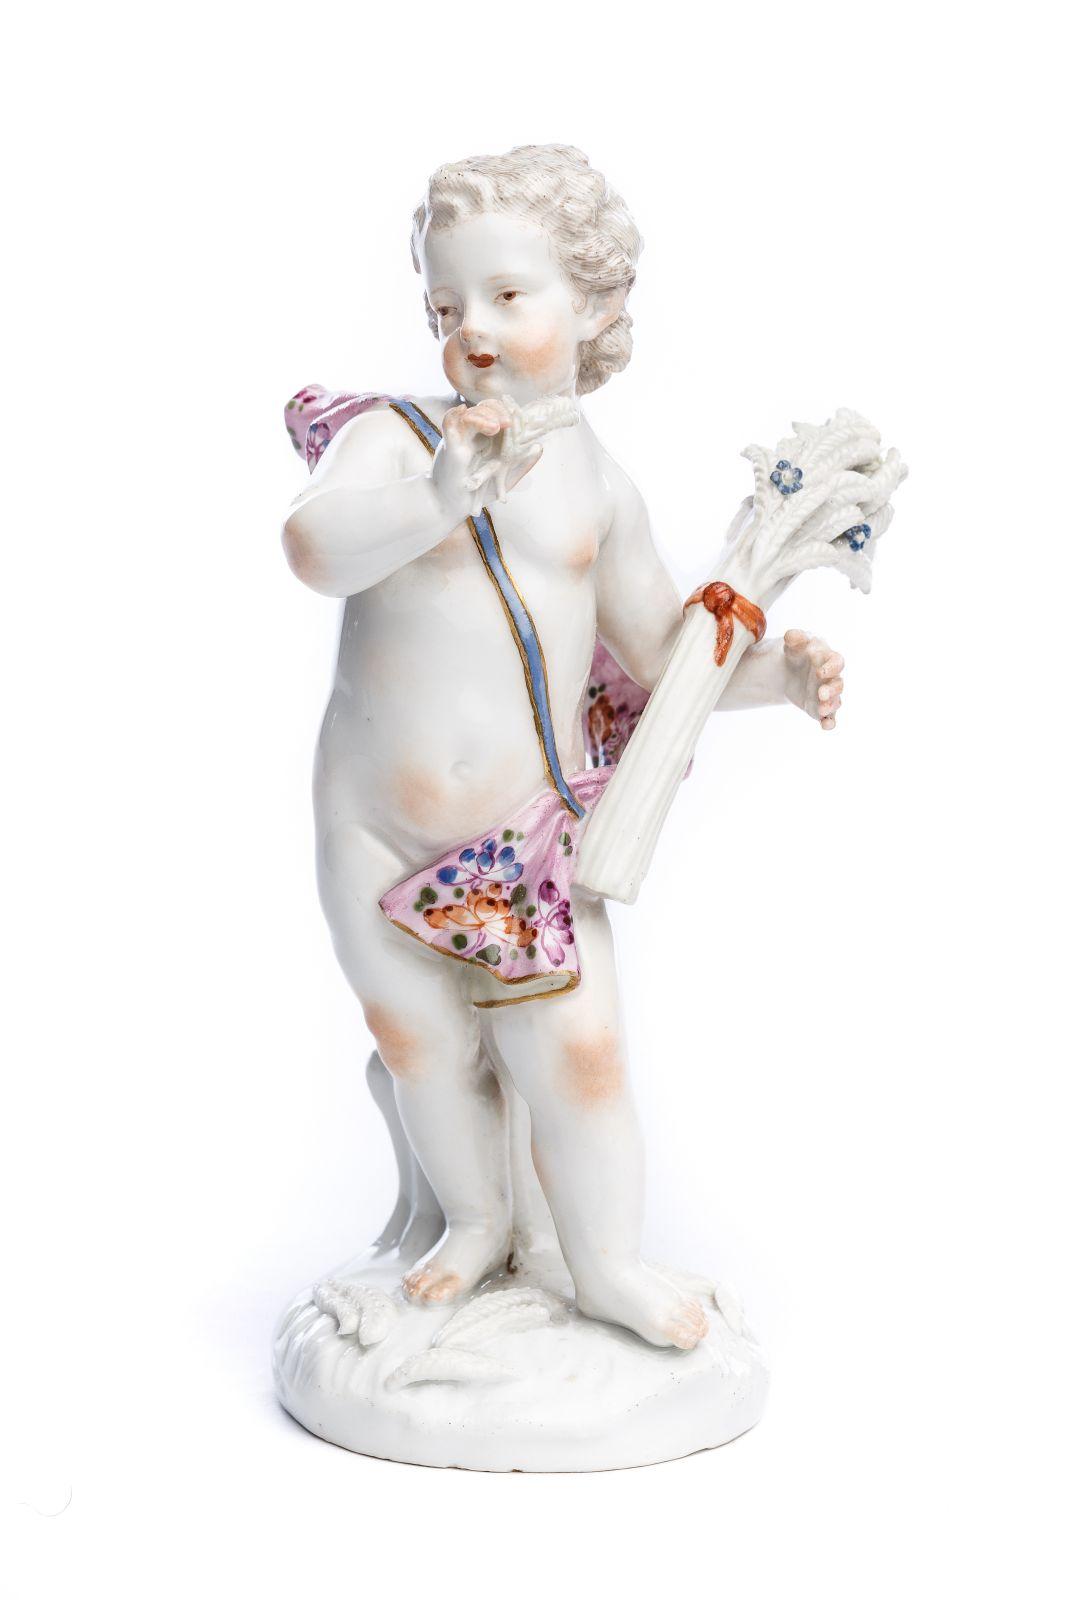 #56 Porcelain figure Image